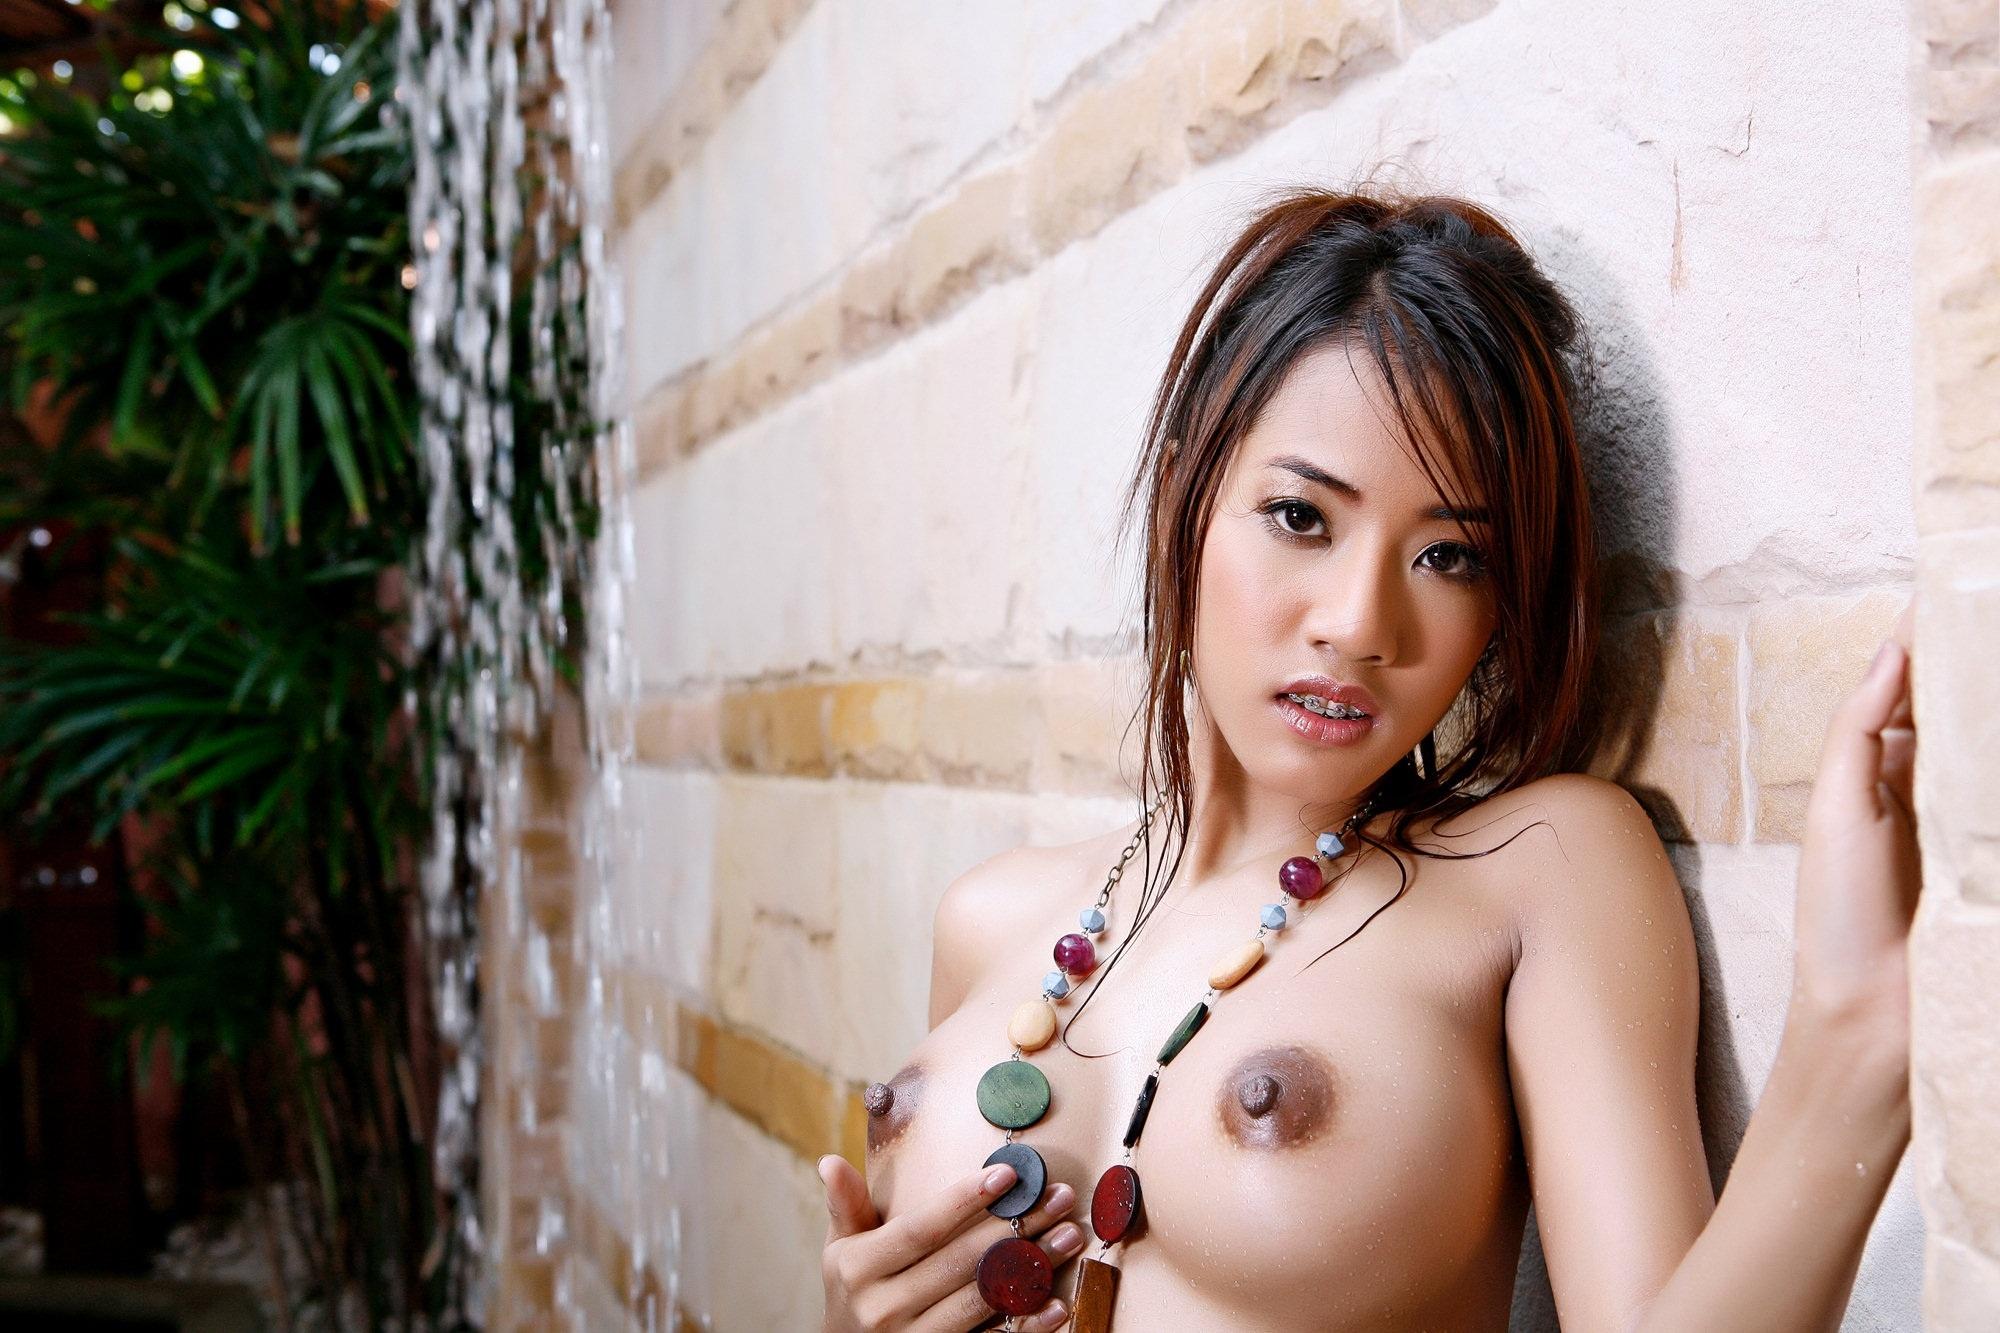 Mature tits bra nipples saggy